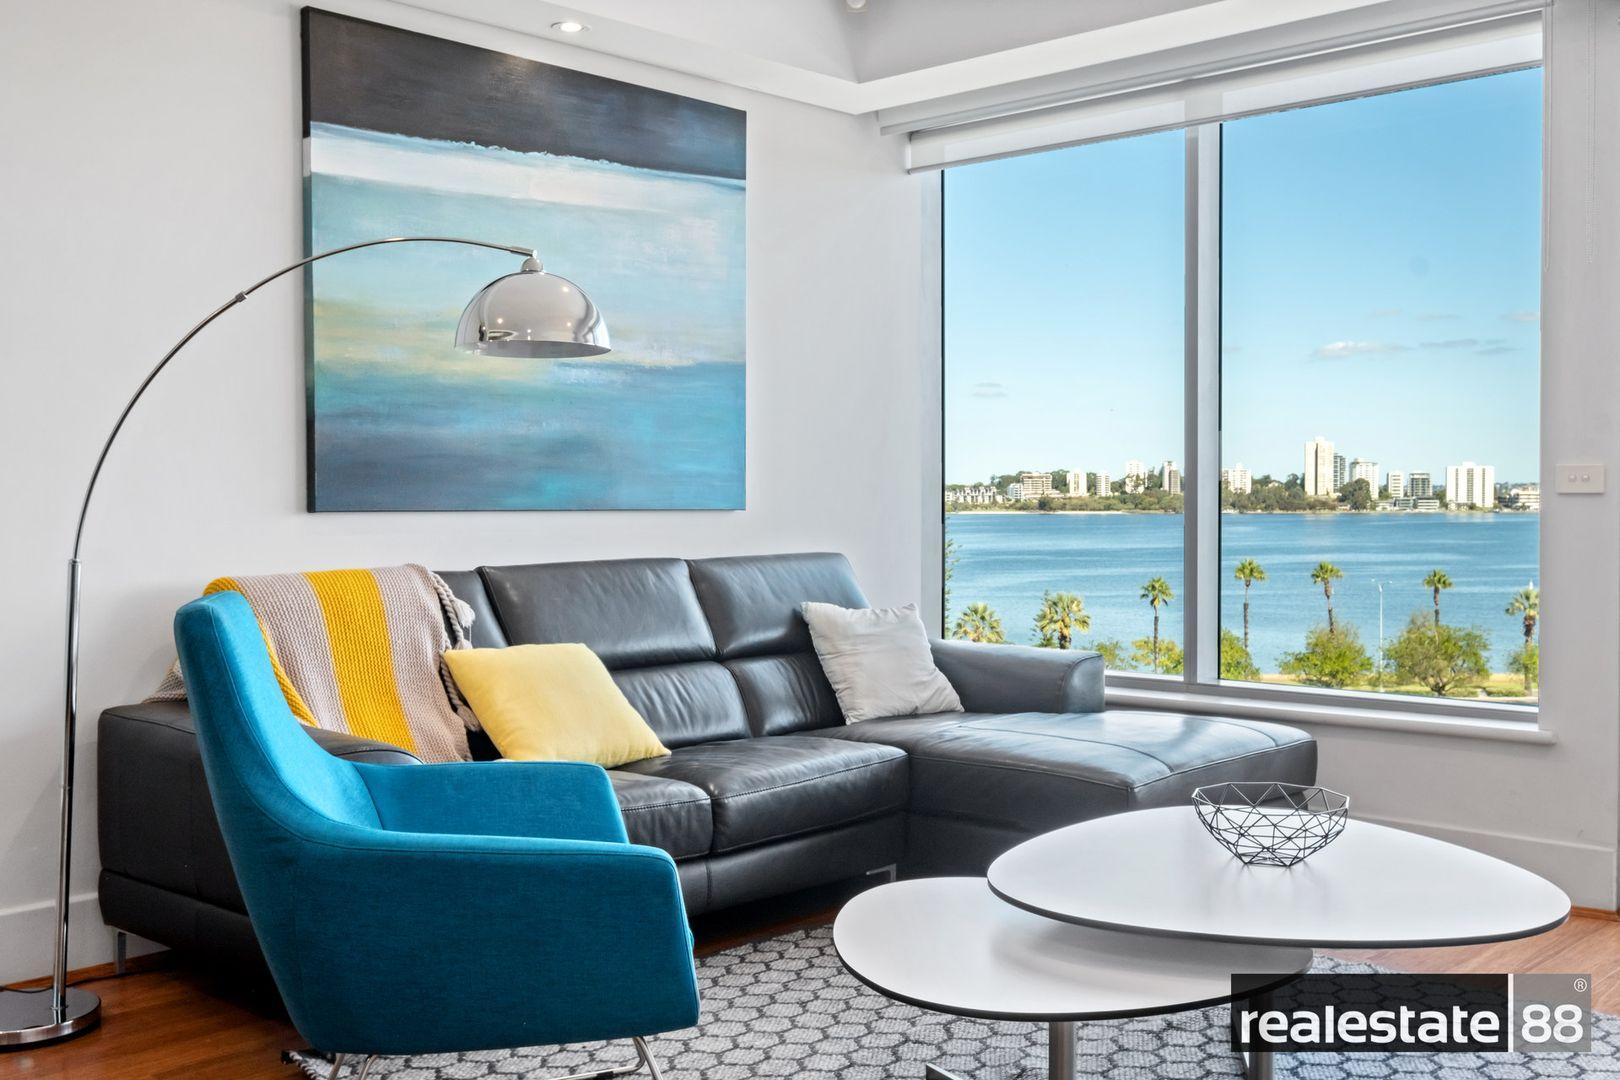 2 bedrooms Apartment / Unit / Flat in 603/108 Terrace Road EAST PERTH WA, 6004